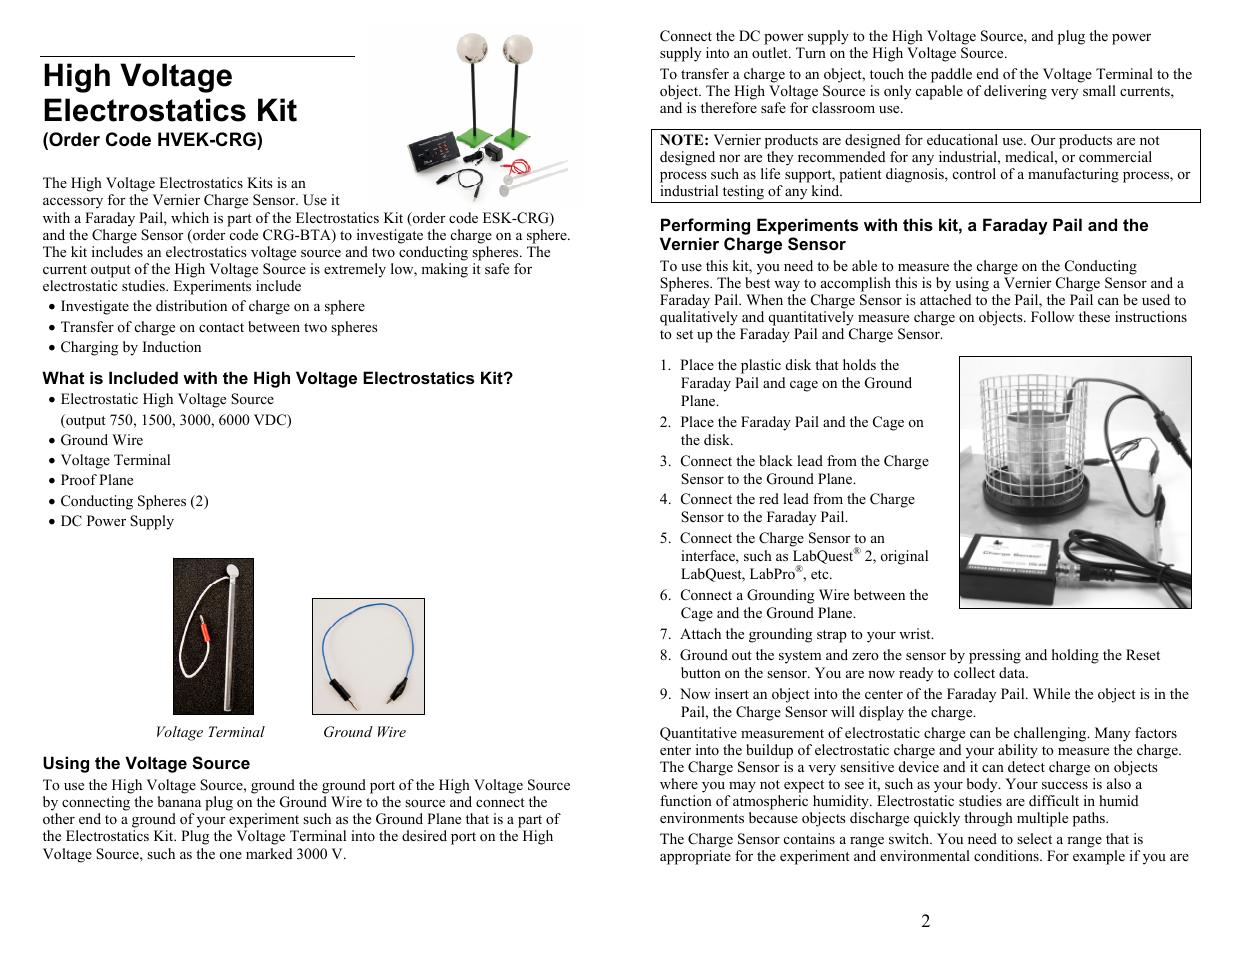 Vernier Mirror Set for Optics Expansion Kit User Manual | 4